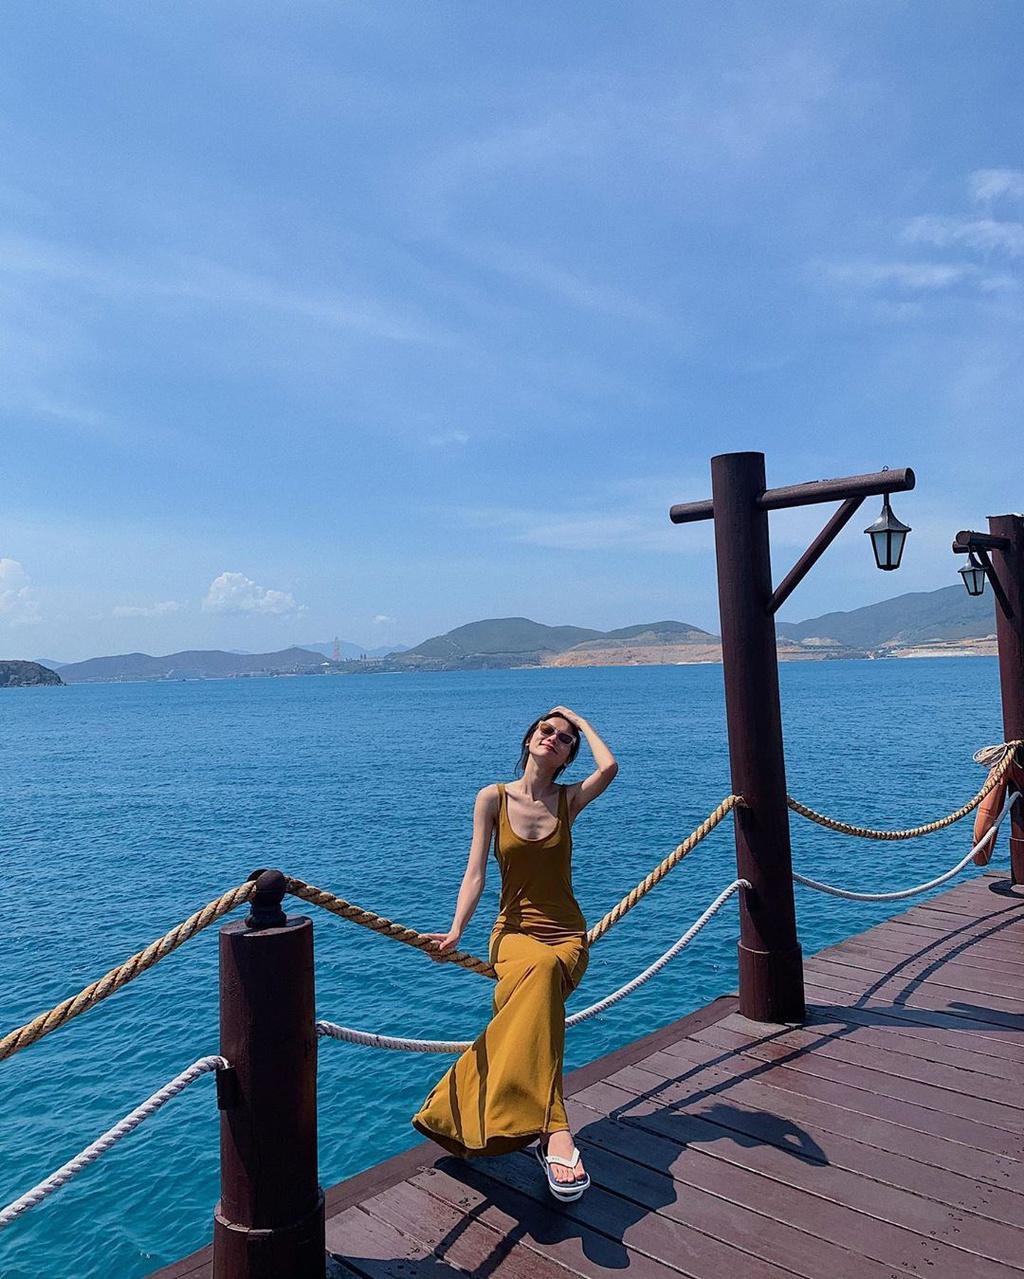 Alluring wooden bridges amidst blue sea in Vietnam's famous tourism hub